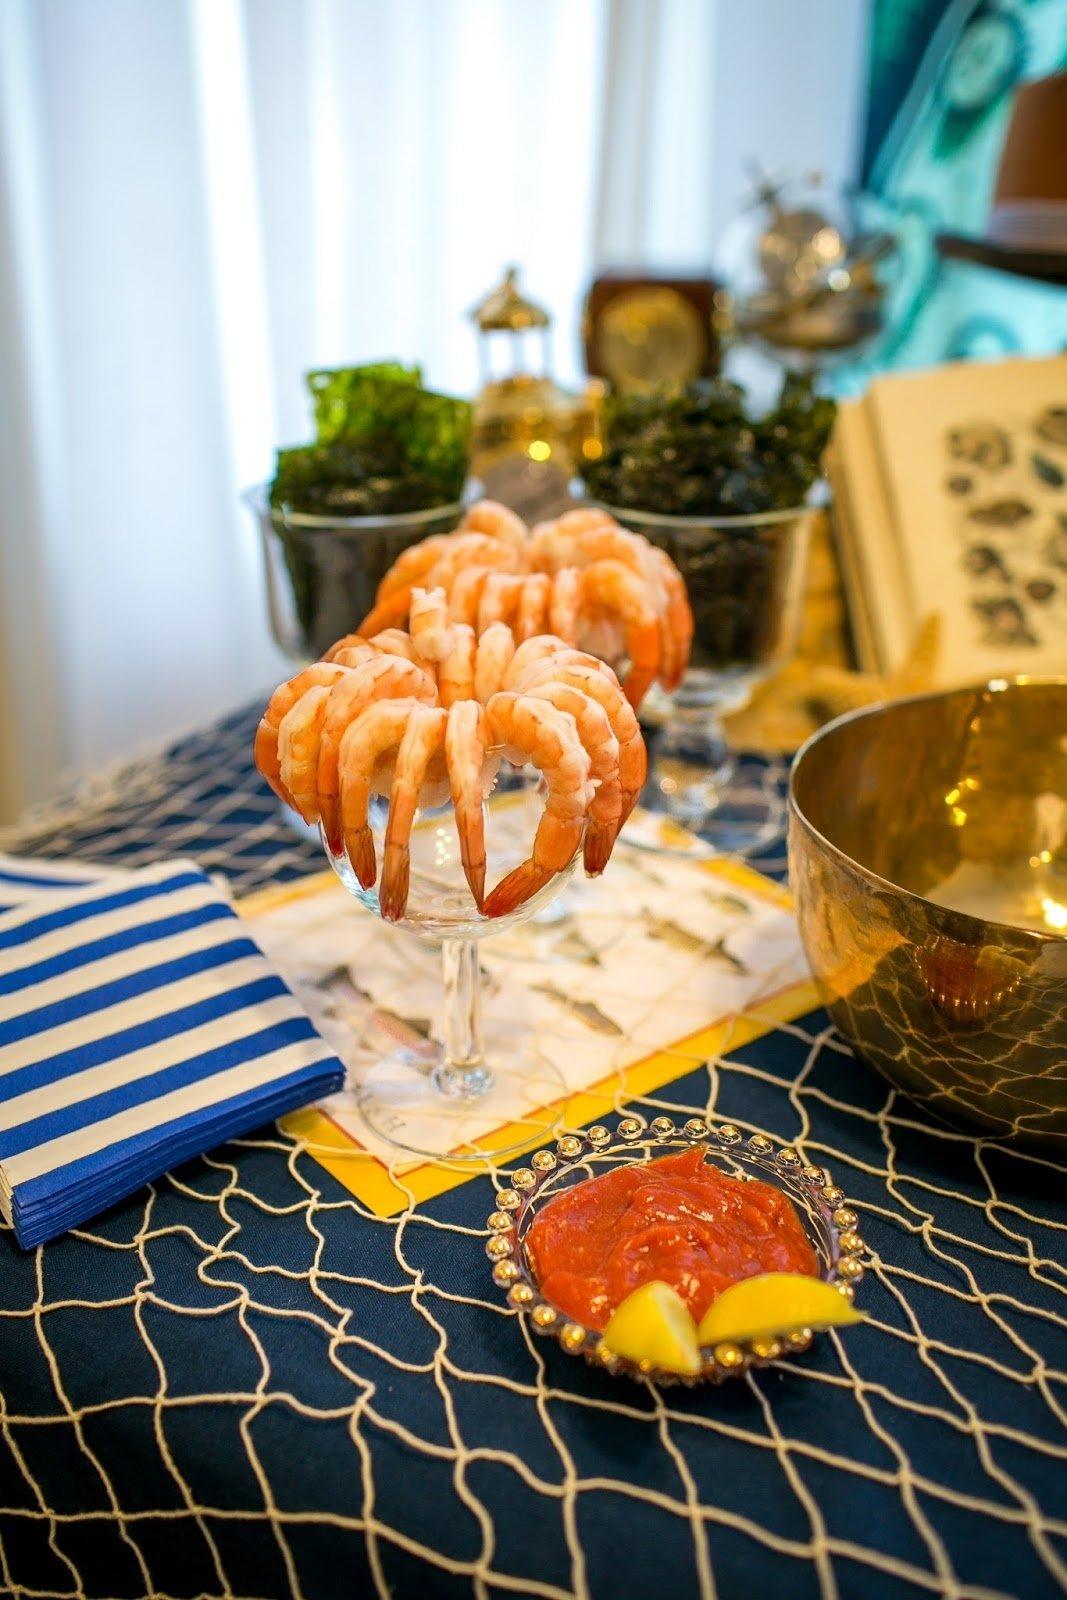 10 Beautiful Under The Sea Food Ideas delicious reads food ideas for 20000 leagues under the sea by 2021